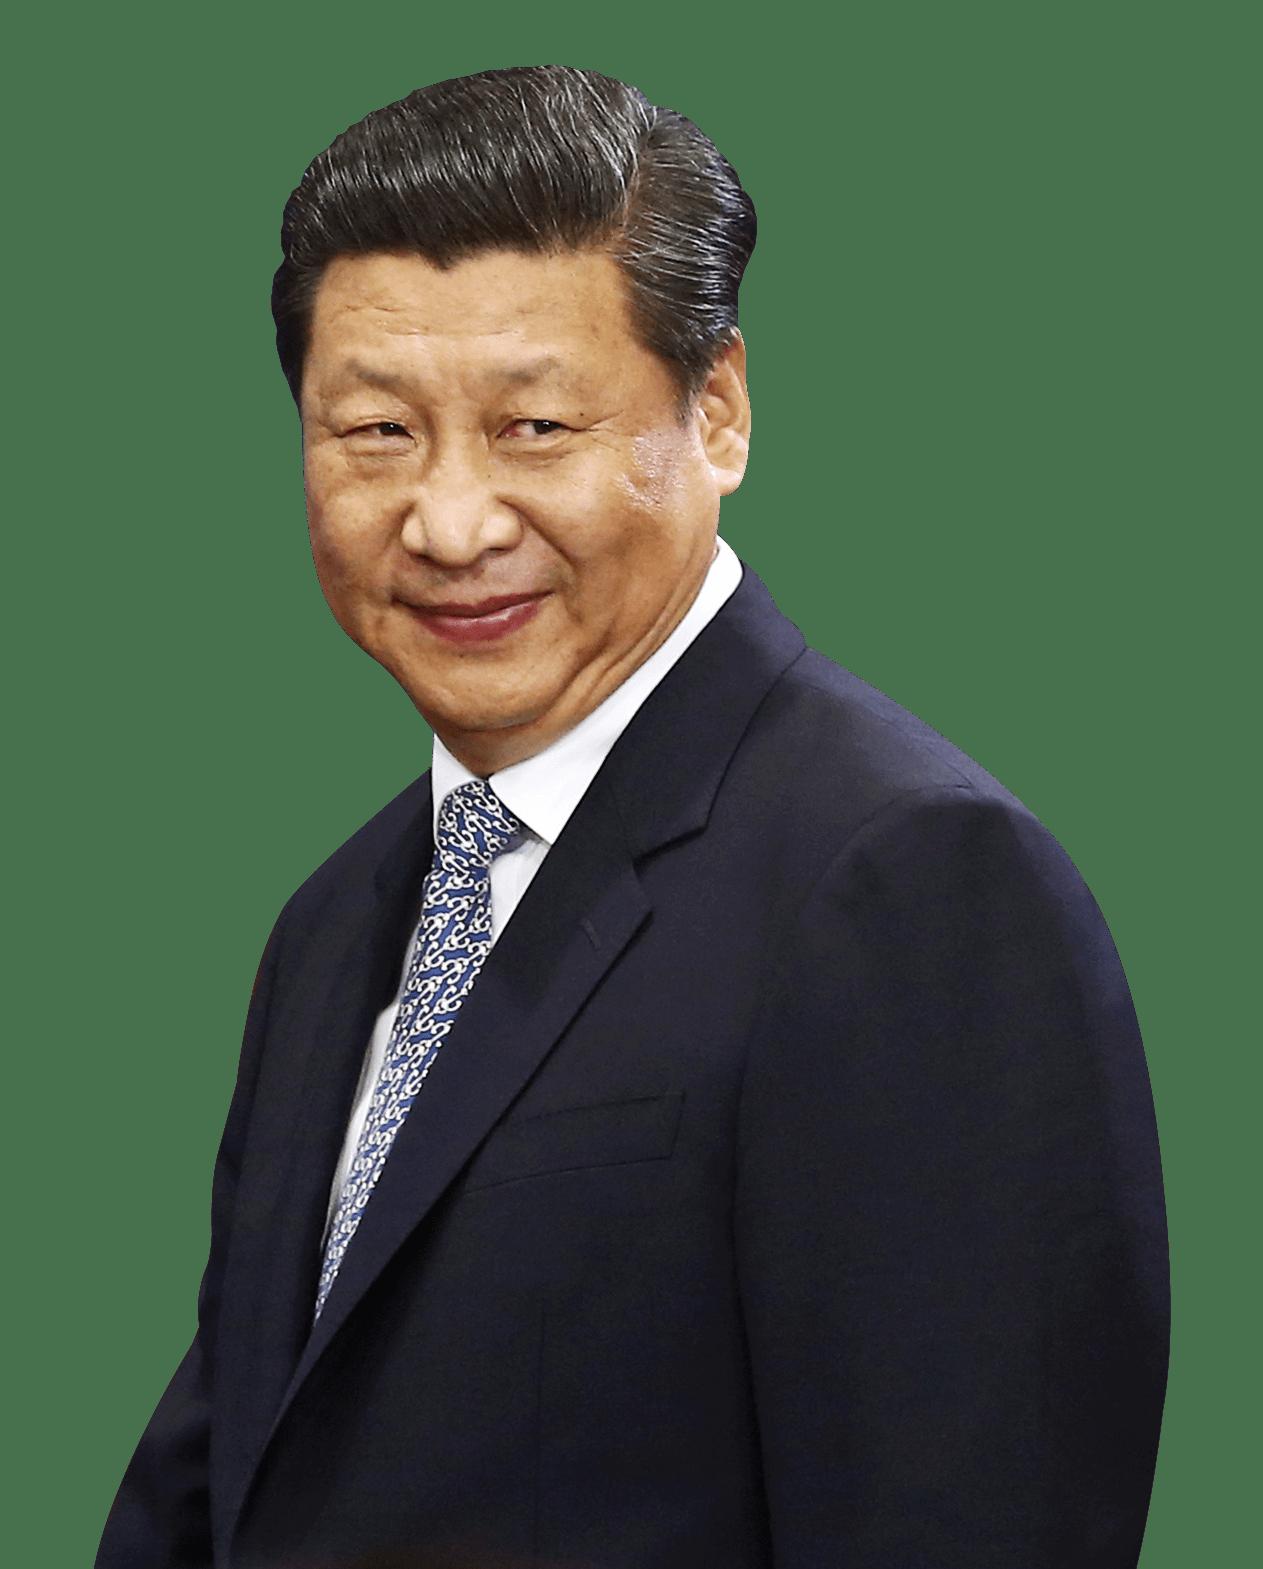 Xi Jinping Side View transparent PNG.